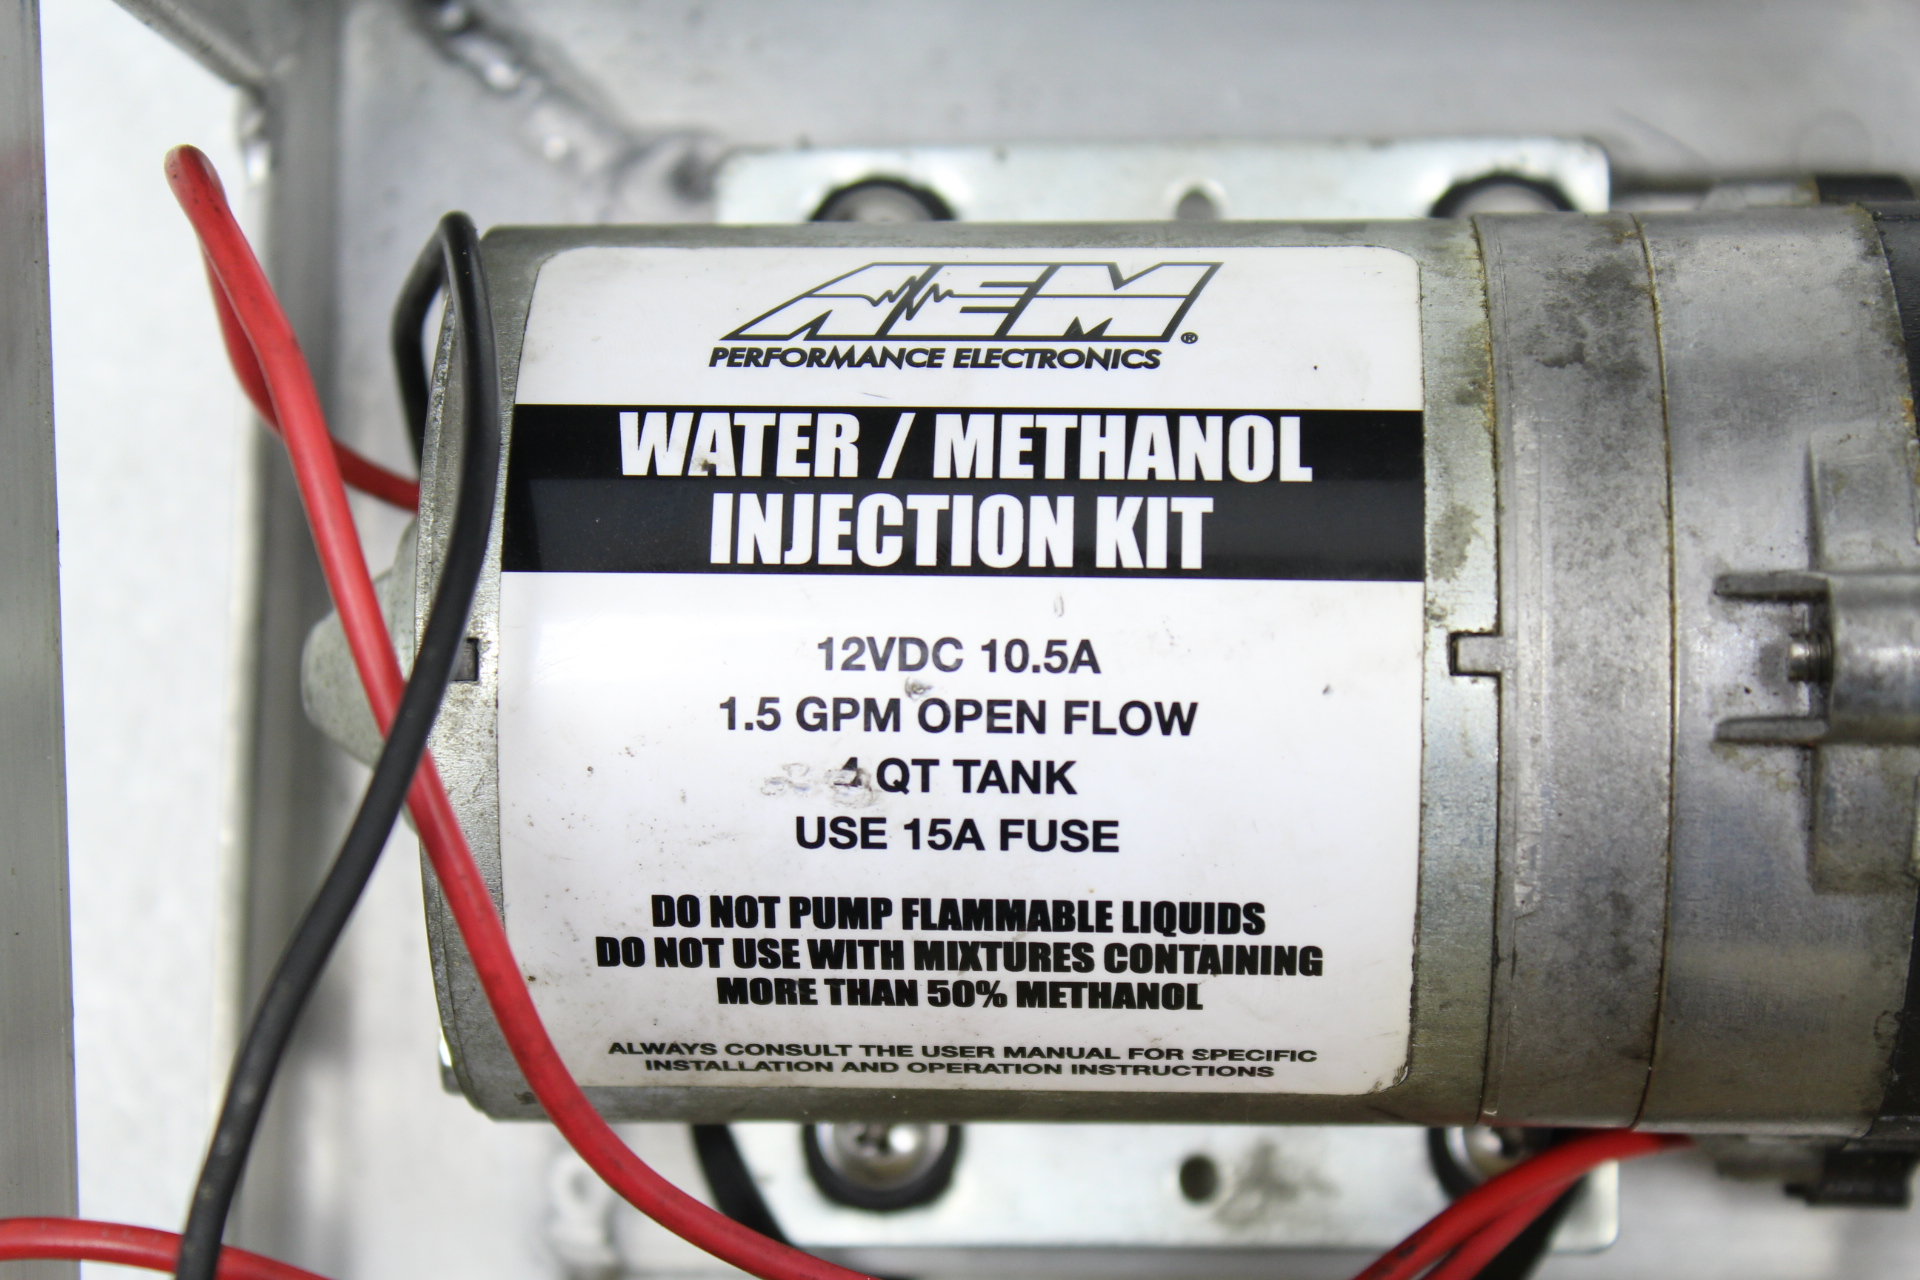 SUBARU IMPREZA WRX STI AEM WATERMETHANOL INJECTION KIT - Aem water methanol kit wiring diagram